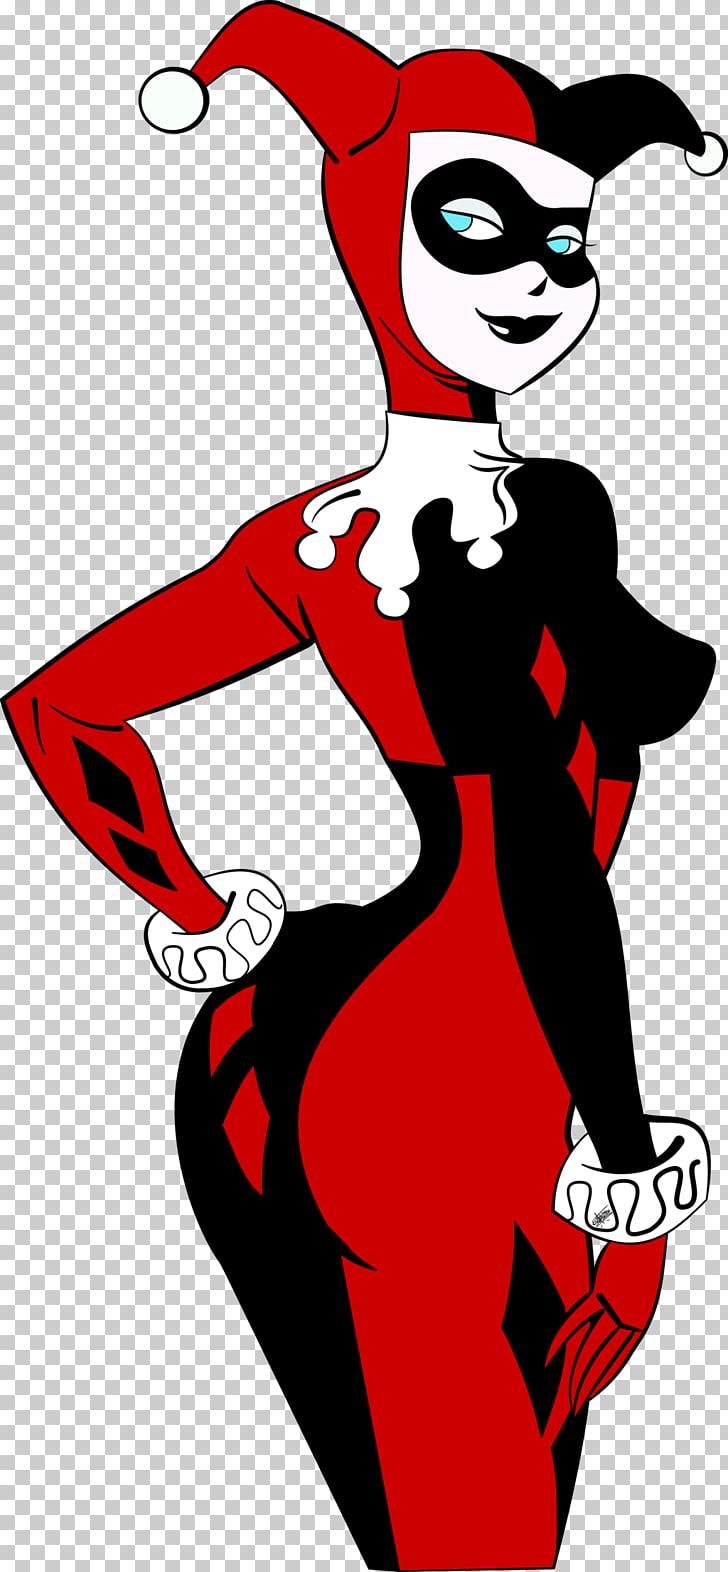 medium resolution of harley quinn batman joker cartoon comics harley png clipart